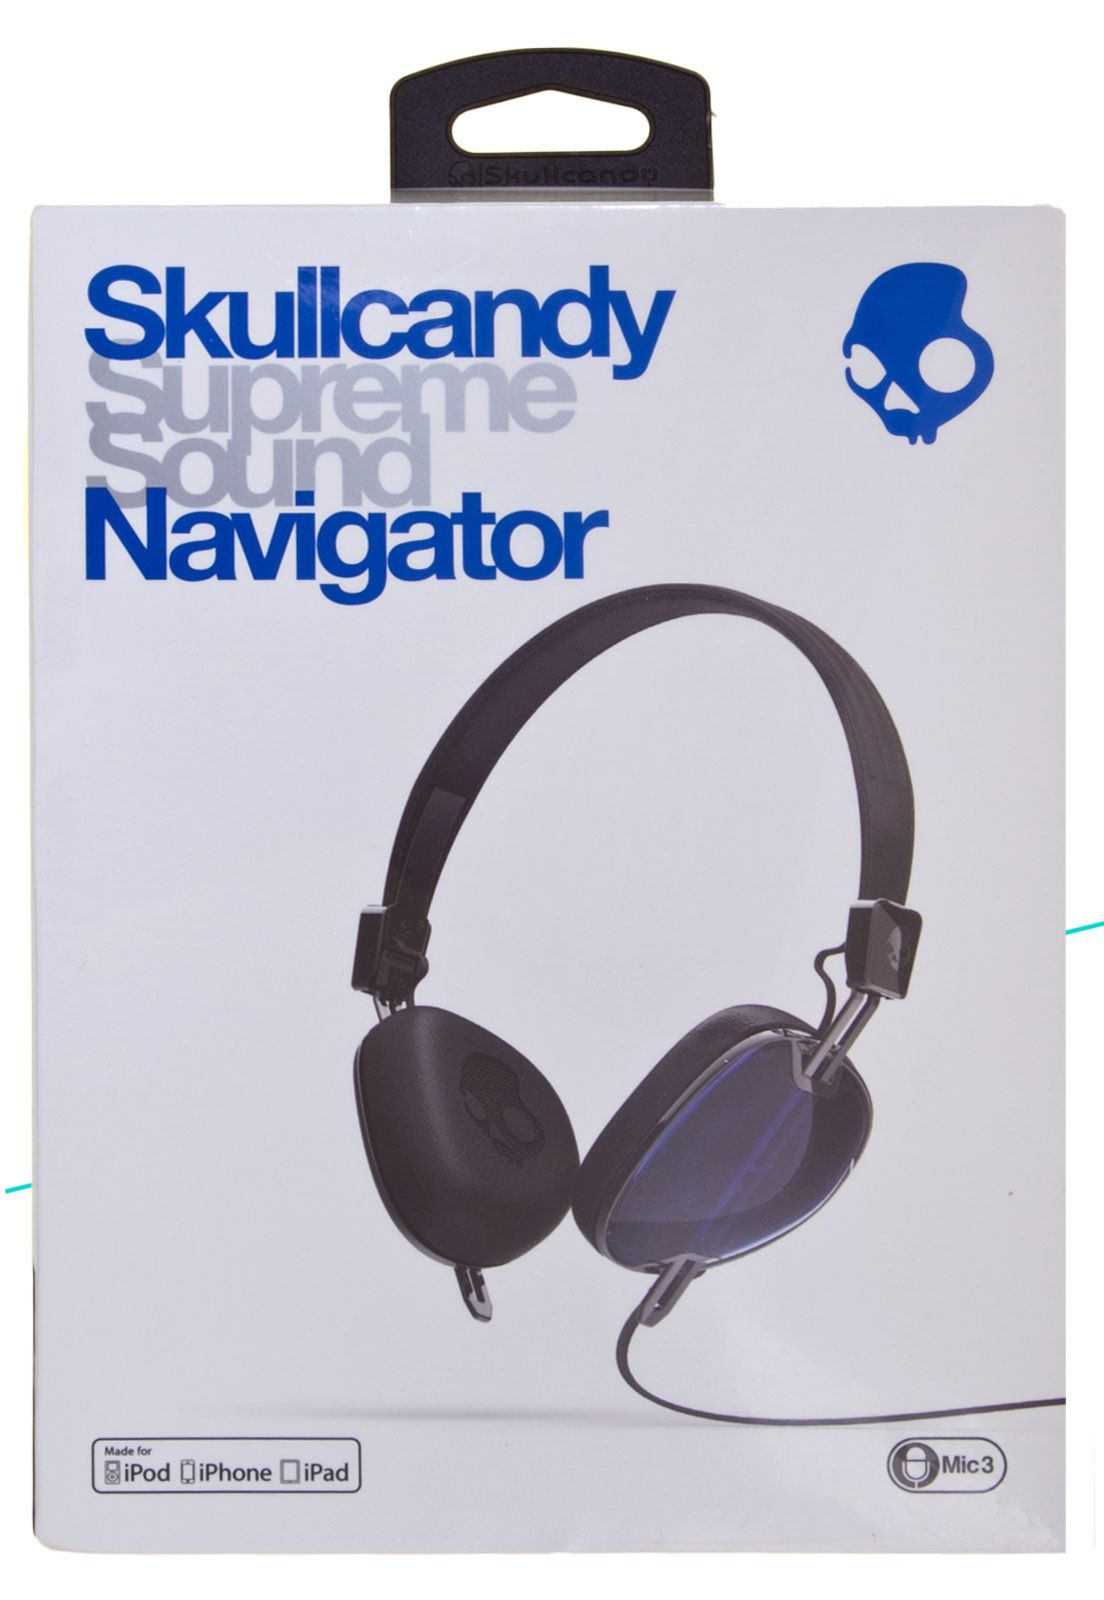 Fone de ouvido Skullcandy Navigator S5AVFM 289Azul